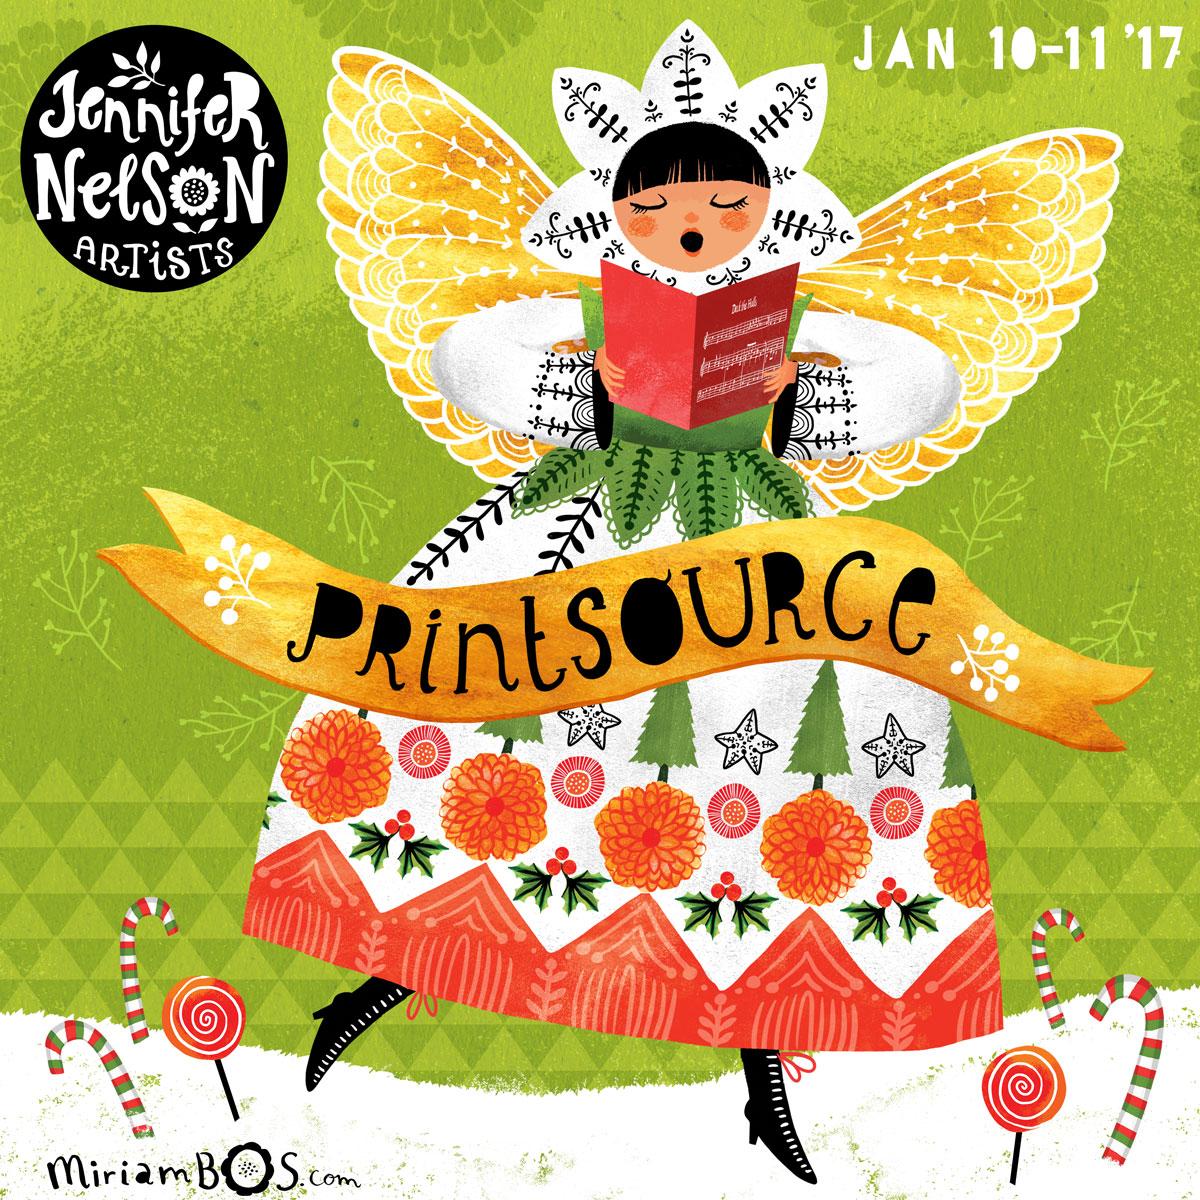 Miriam-Bos-PRINT-HOL-angel-falalala-printsource-web.jpg